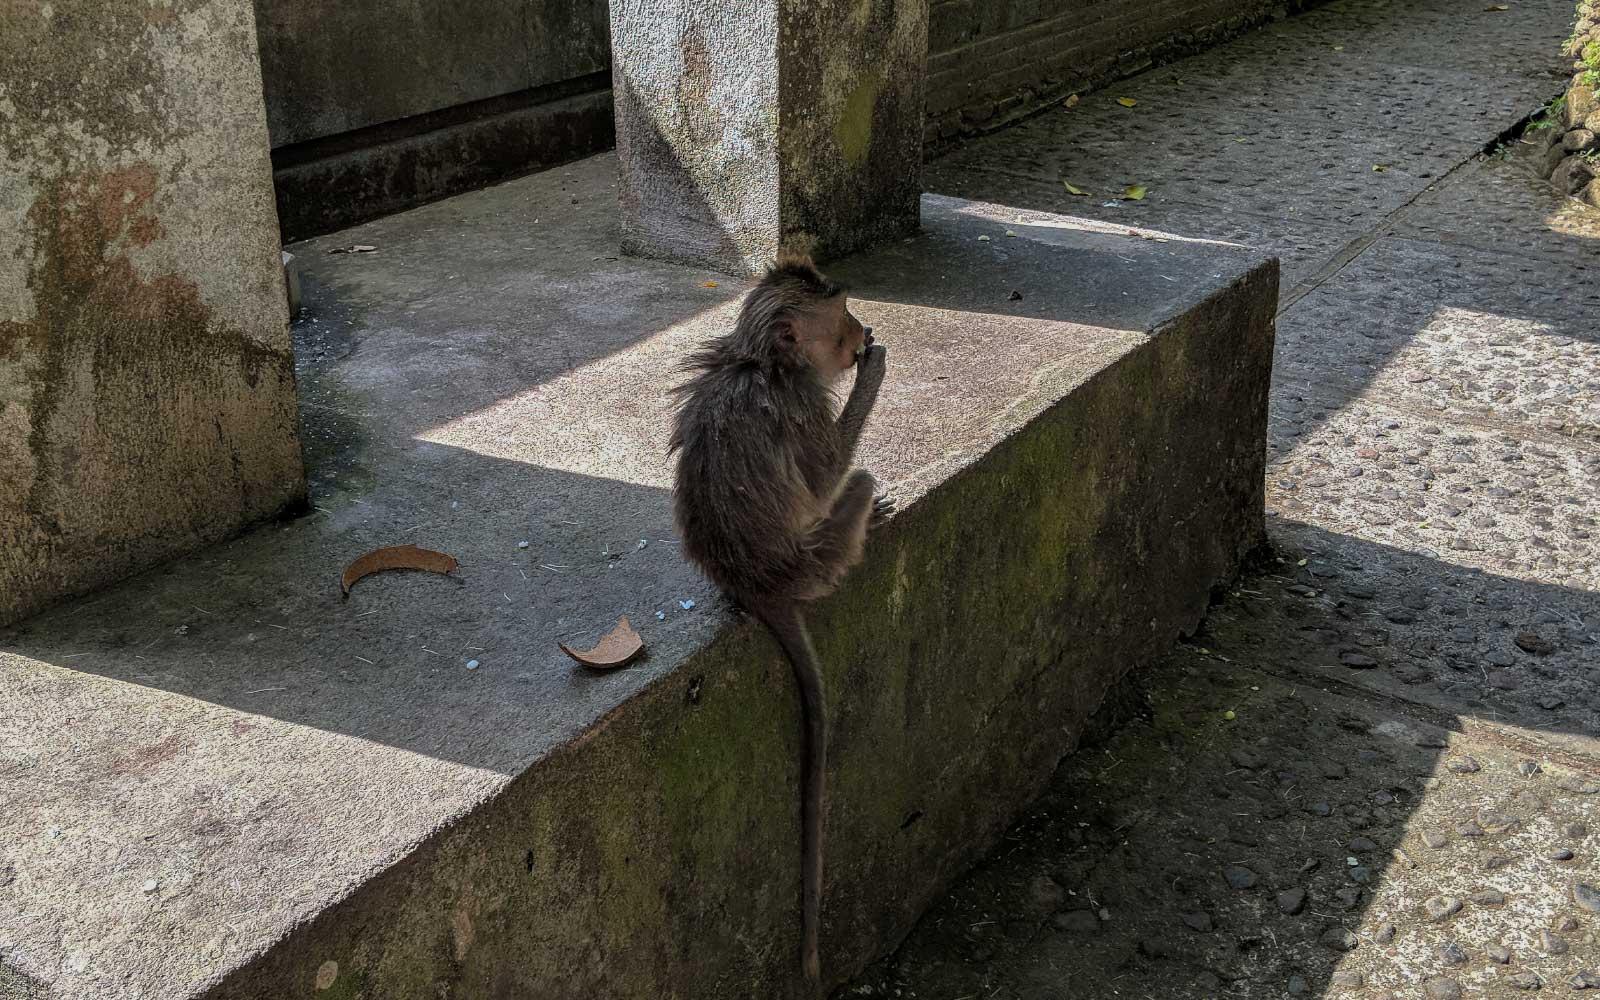 Ubud Monkey Forest: Wildlife in the City